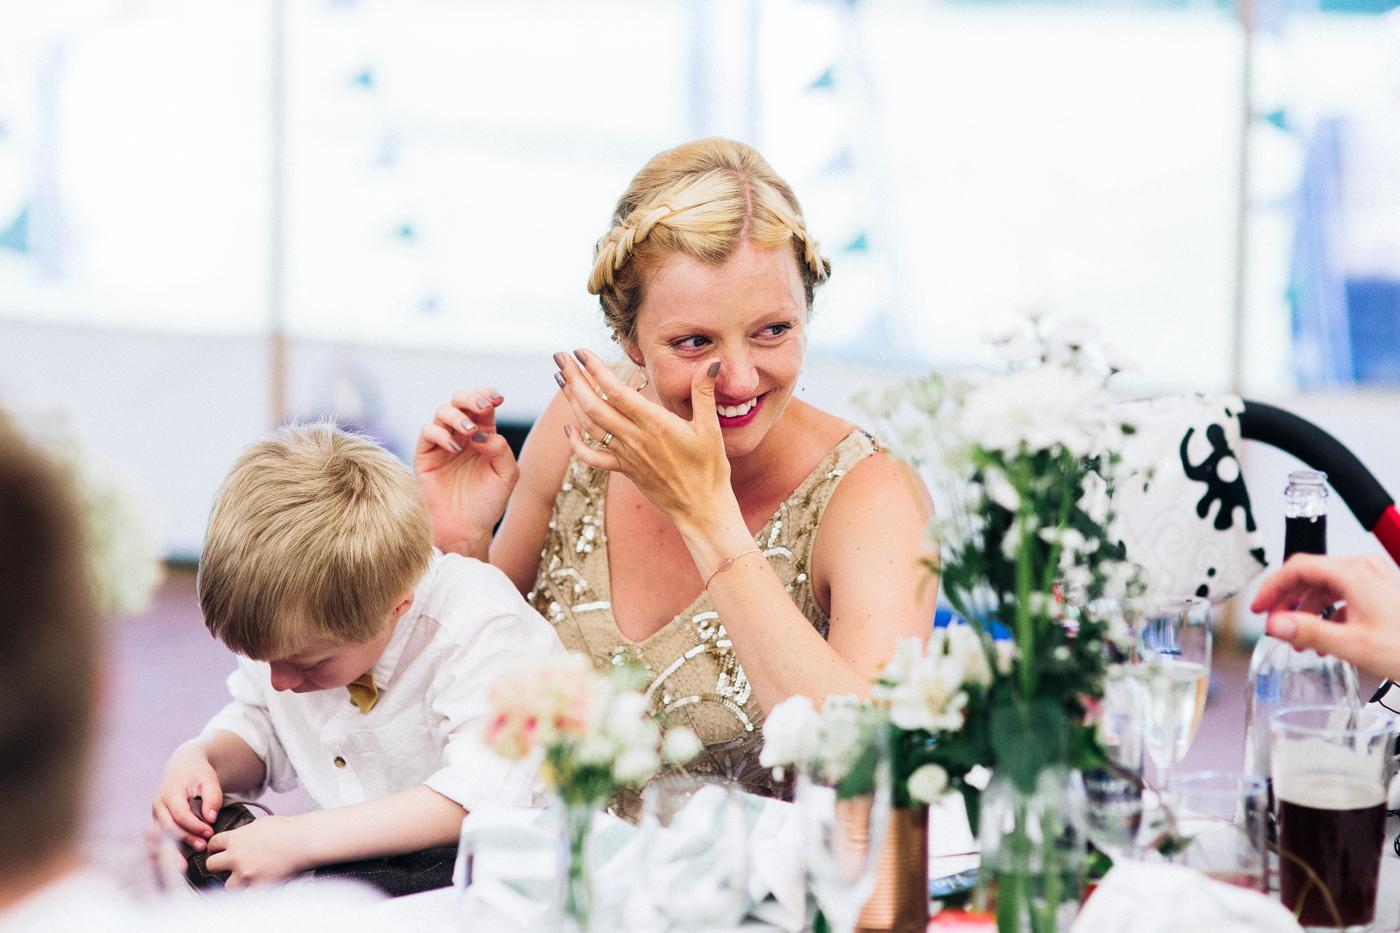 teesside-middlesbrough-north-east-wedding-photographer-creative-wedding-venues-0007.jpg